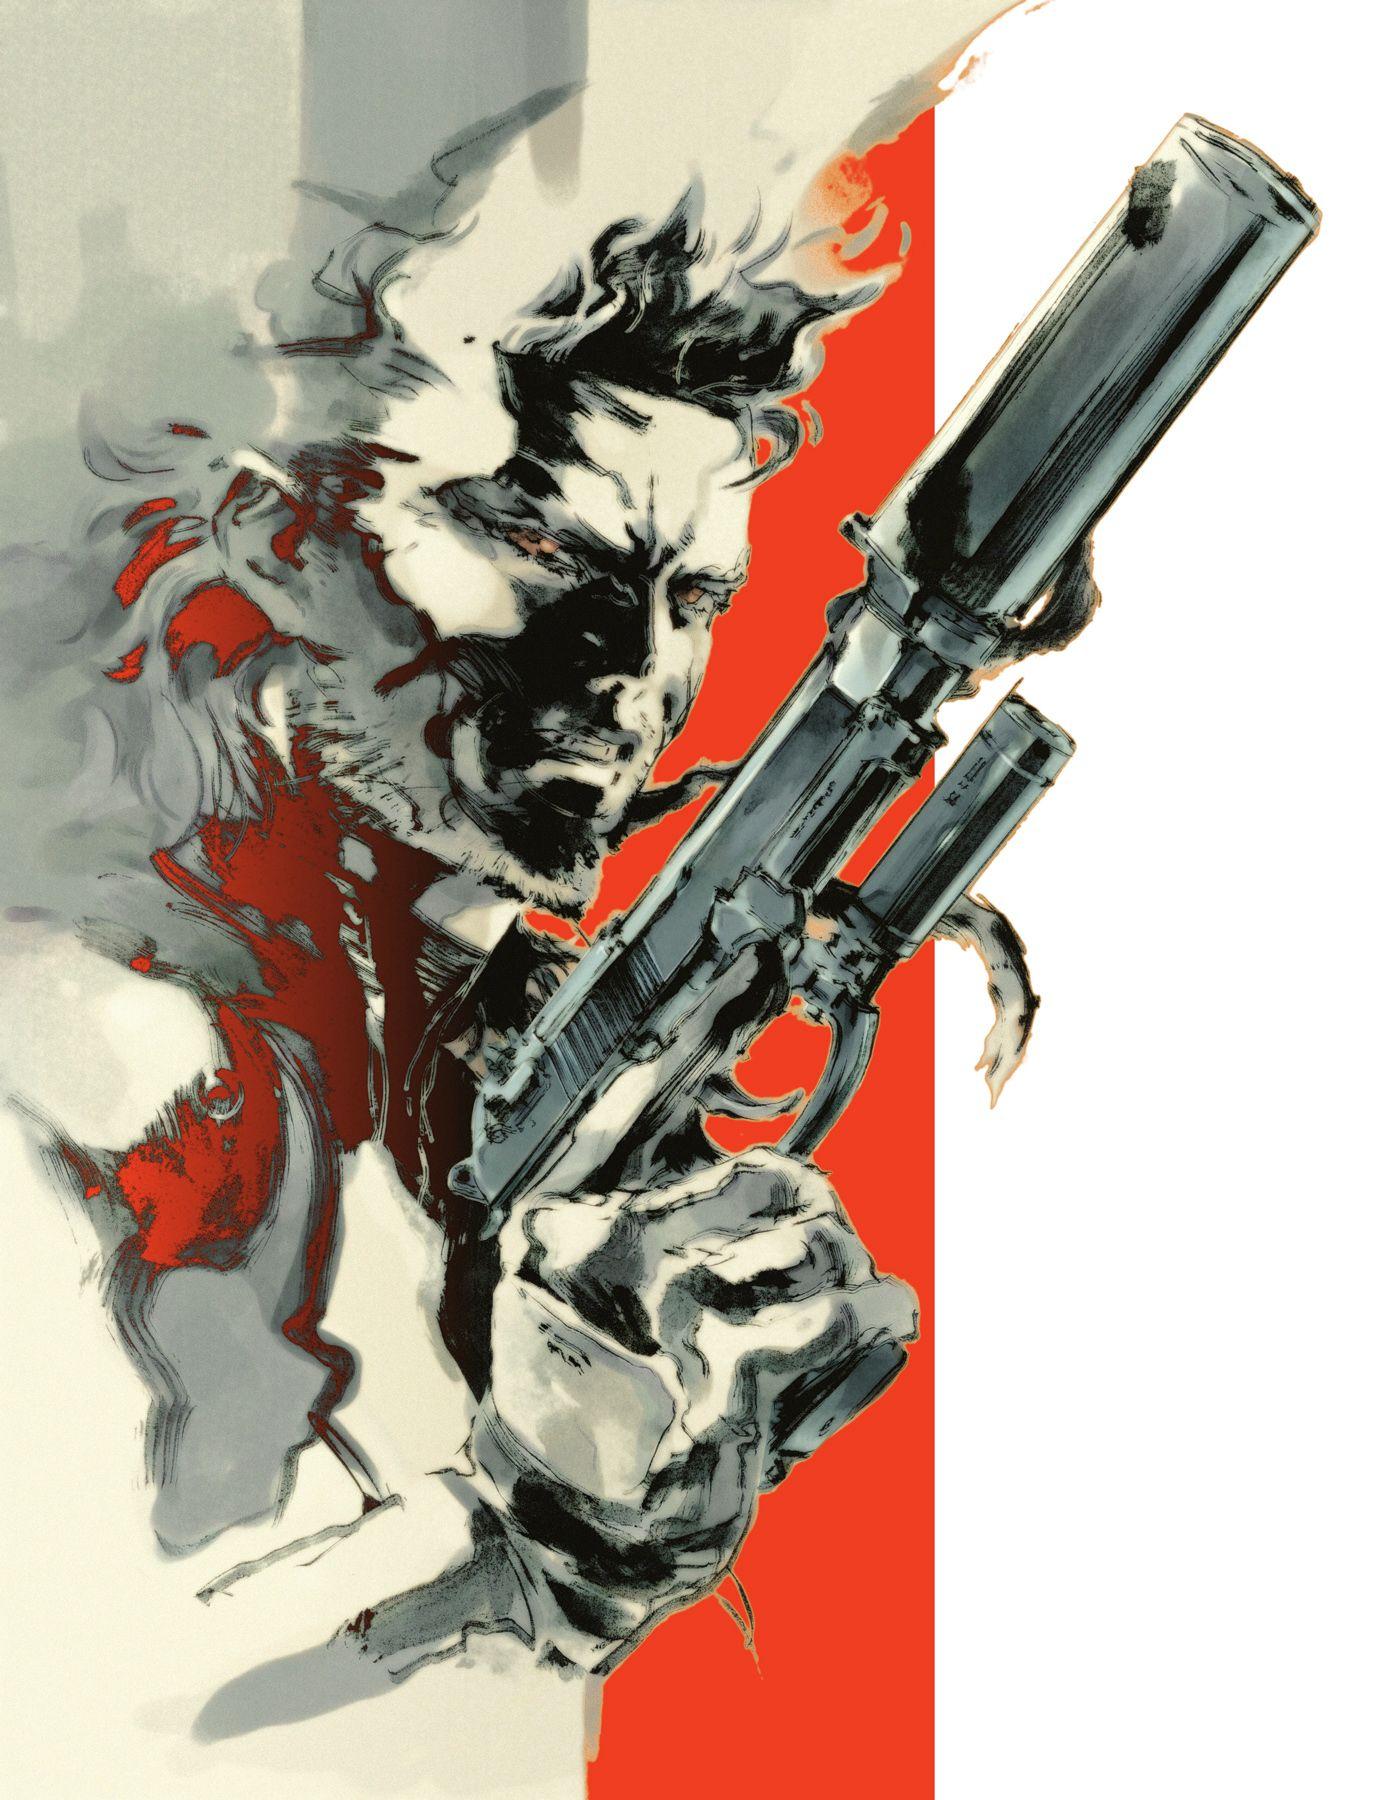 Dark Horse publishing The Art of Metal Gear Solid I-IV collecting Yoji Shinkawa's work https://t.co/ZCIHiykNUw https://t.co/NGFHWnrlrZ